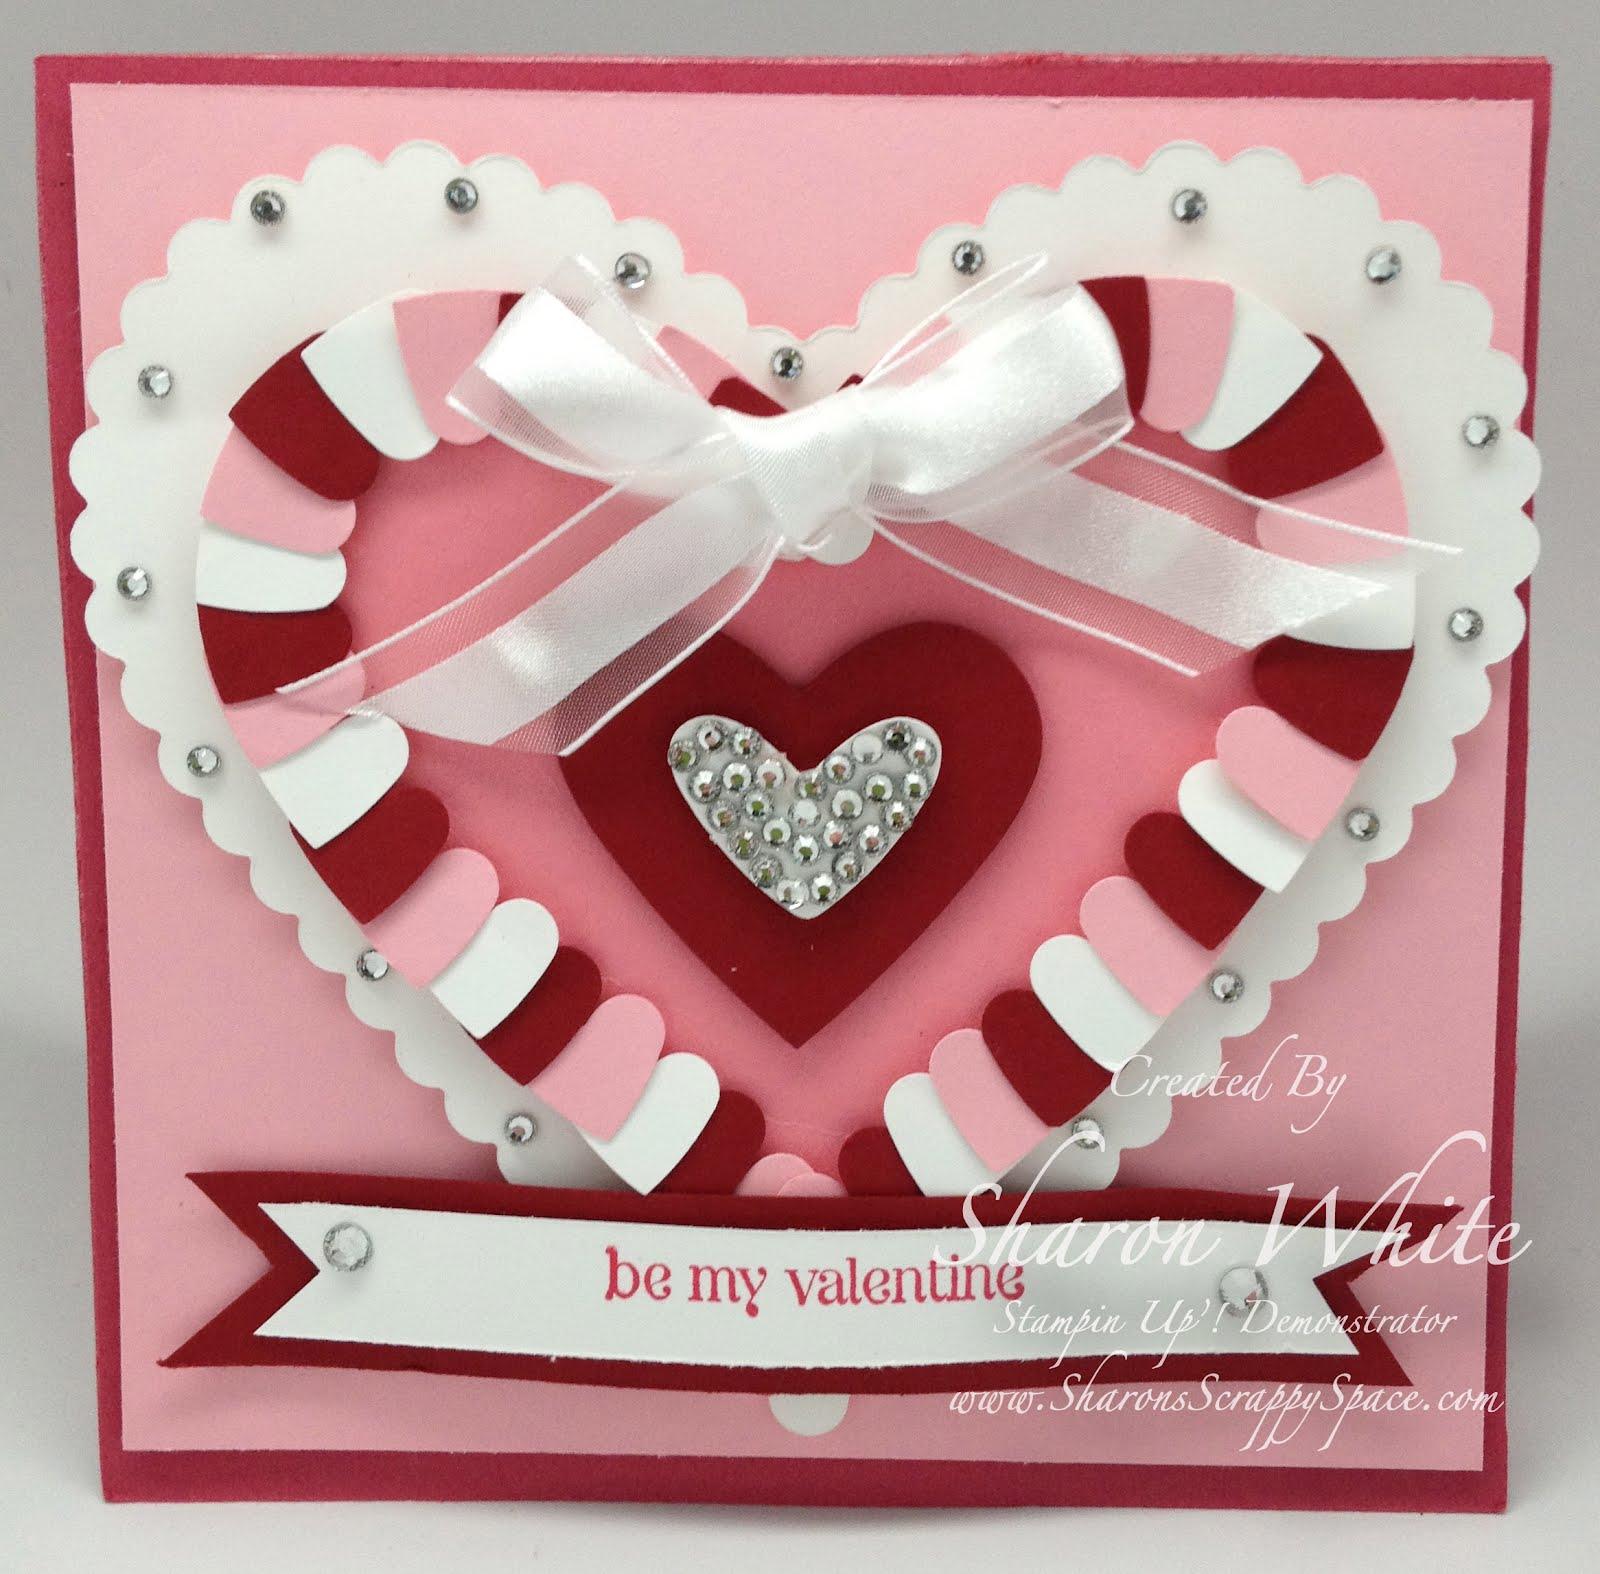 sharon's scrappy space valentine heart card pop up